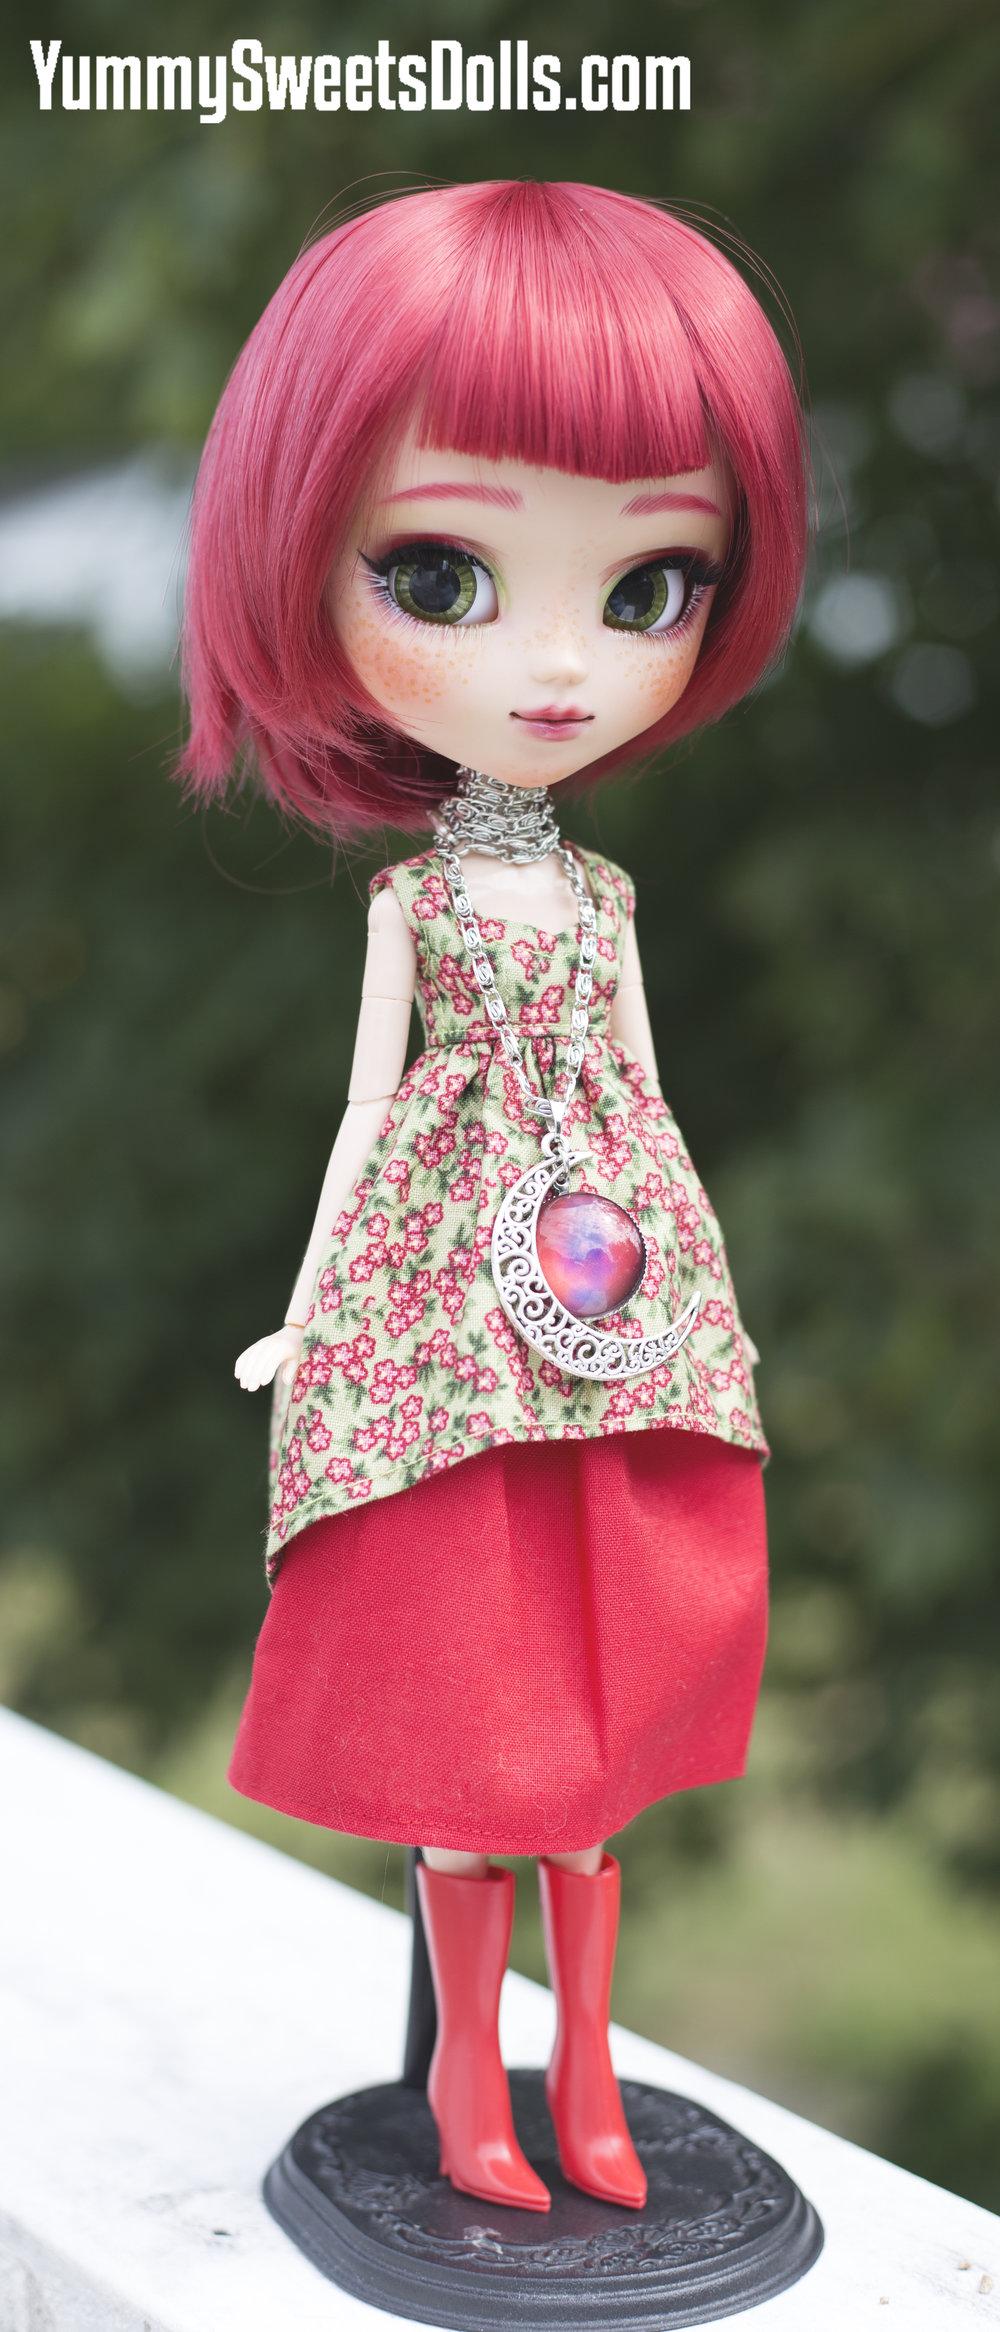 Wild Strawberry by Yummy Sweets Dolls